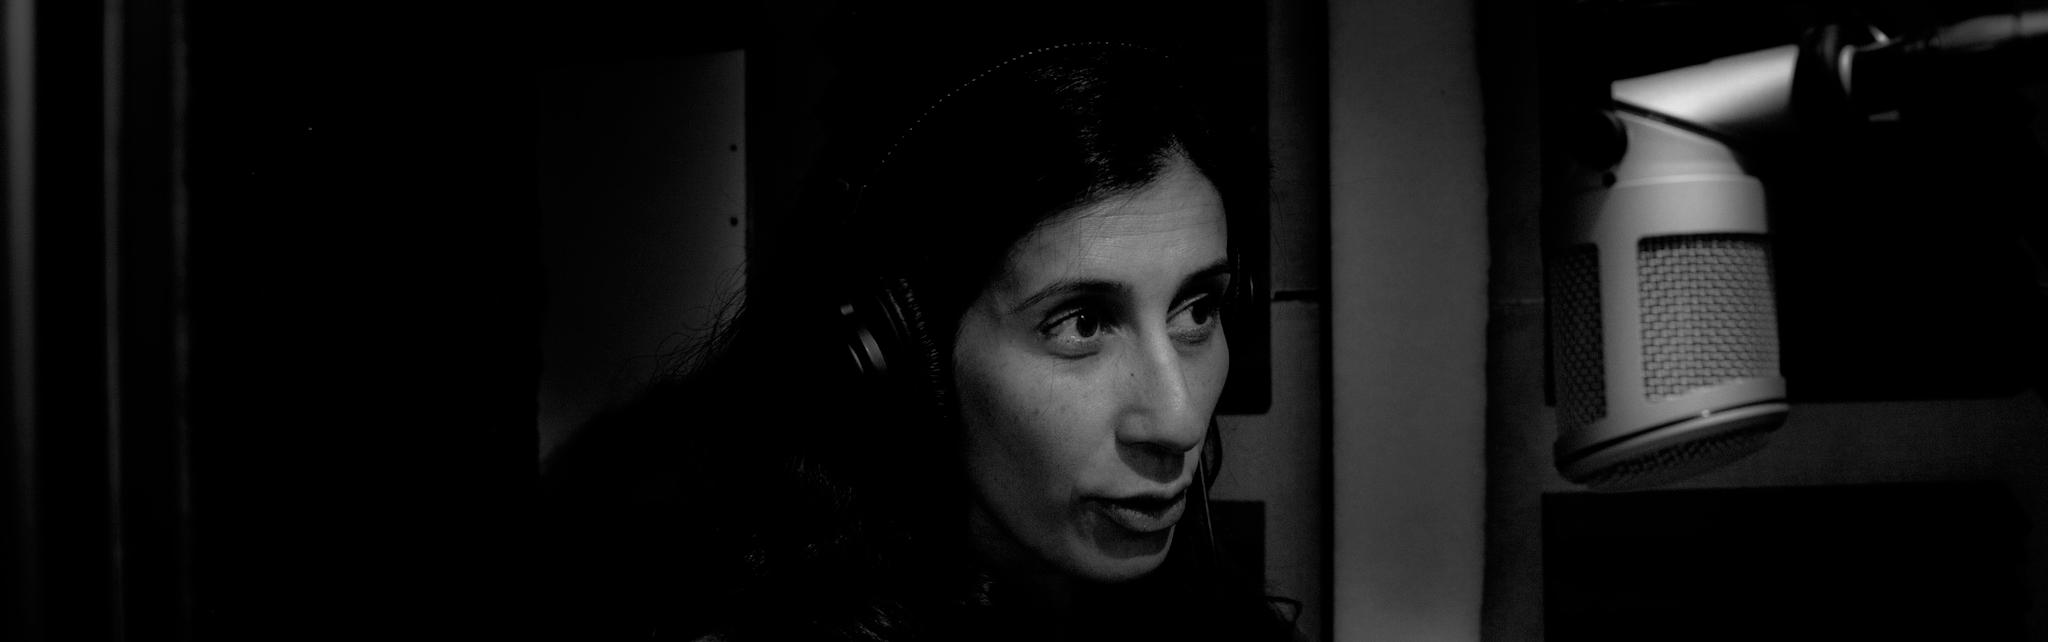 TAMARA MARKUS VOICEOVER/STEMACTRICE